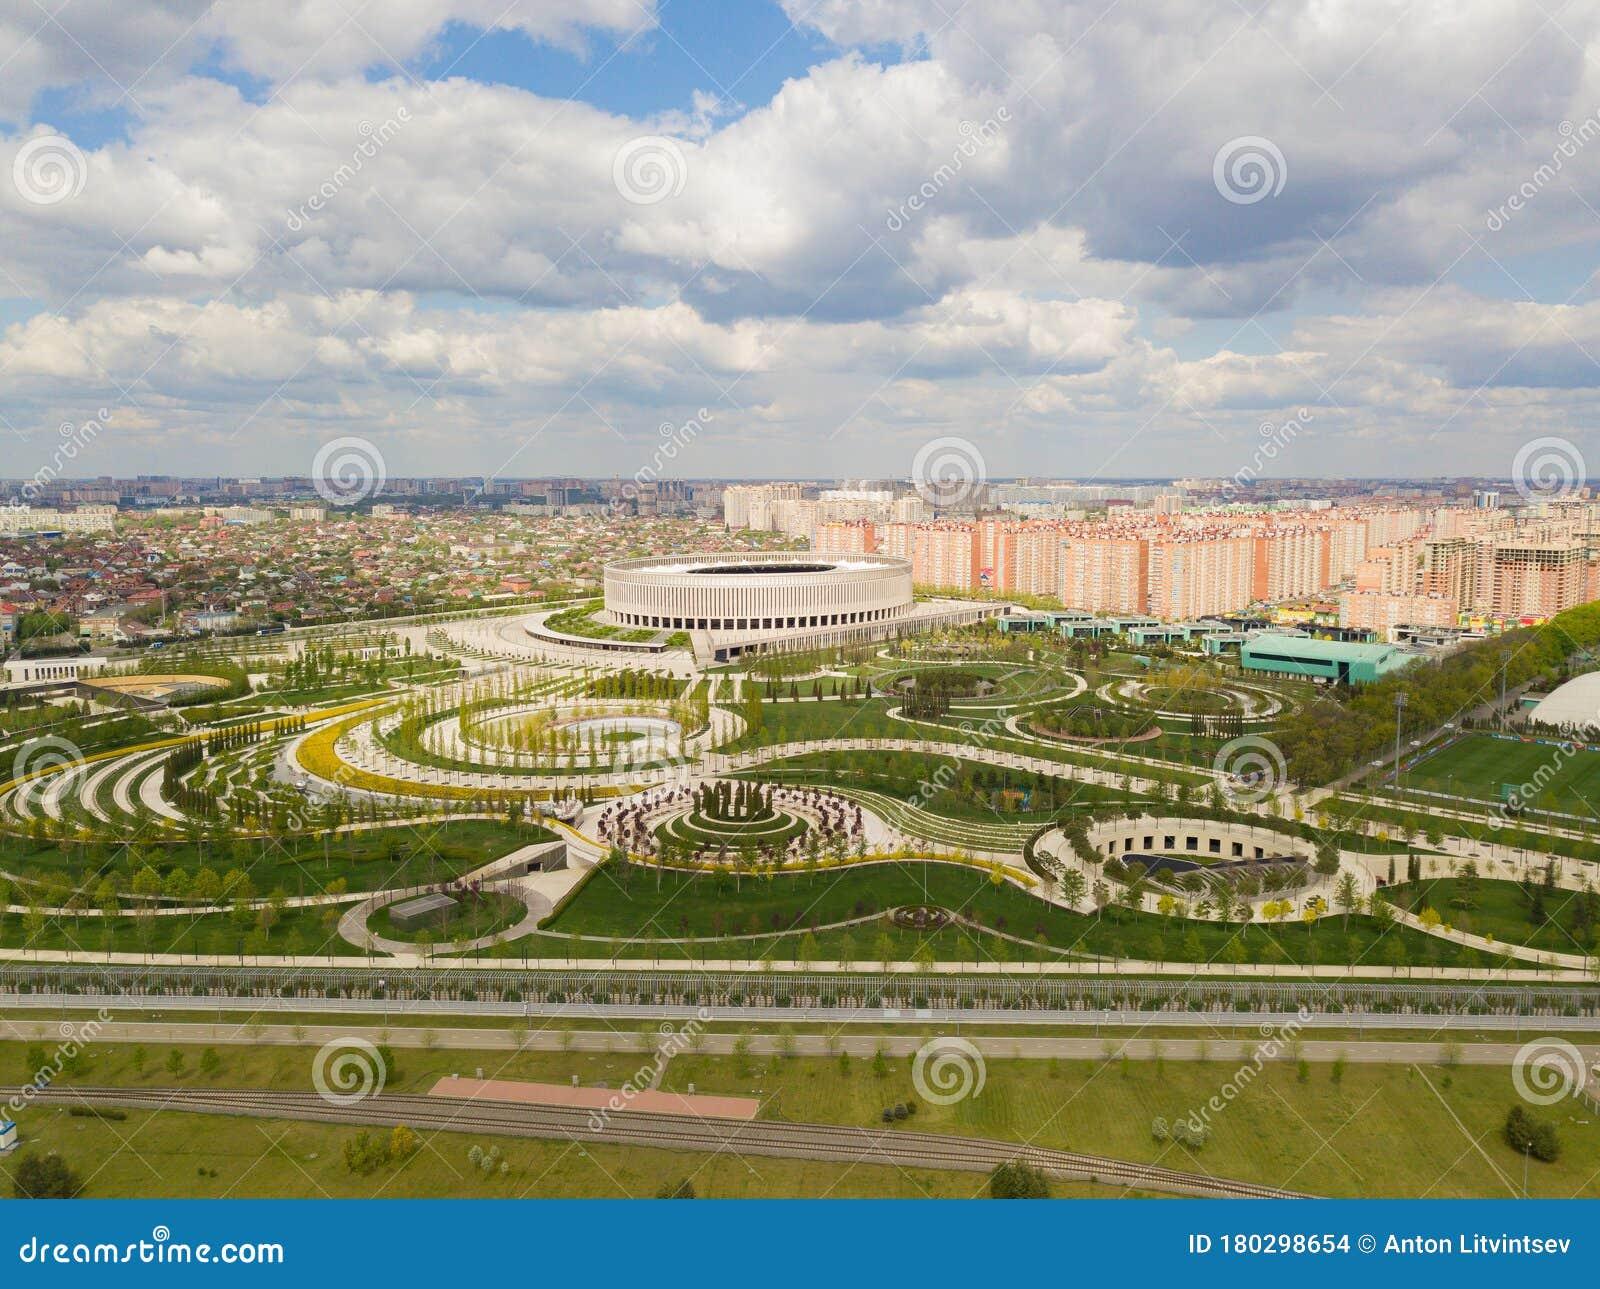 Krasnodar Russia April 2020 Aerial View Of Krasnodar Cityscape And Fc Krasnodar Stadium Editorial Stock Image Image Of View Football 180298654